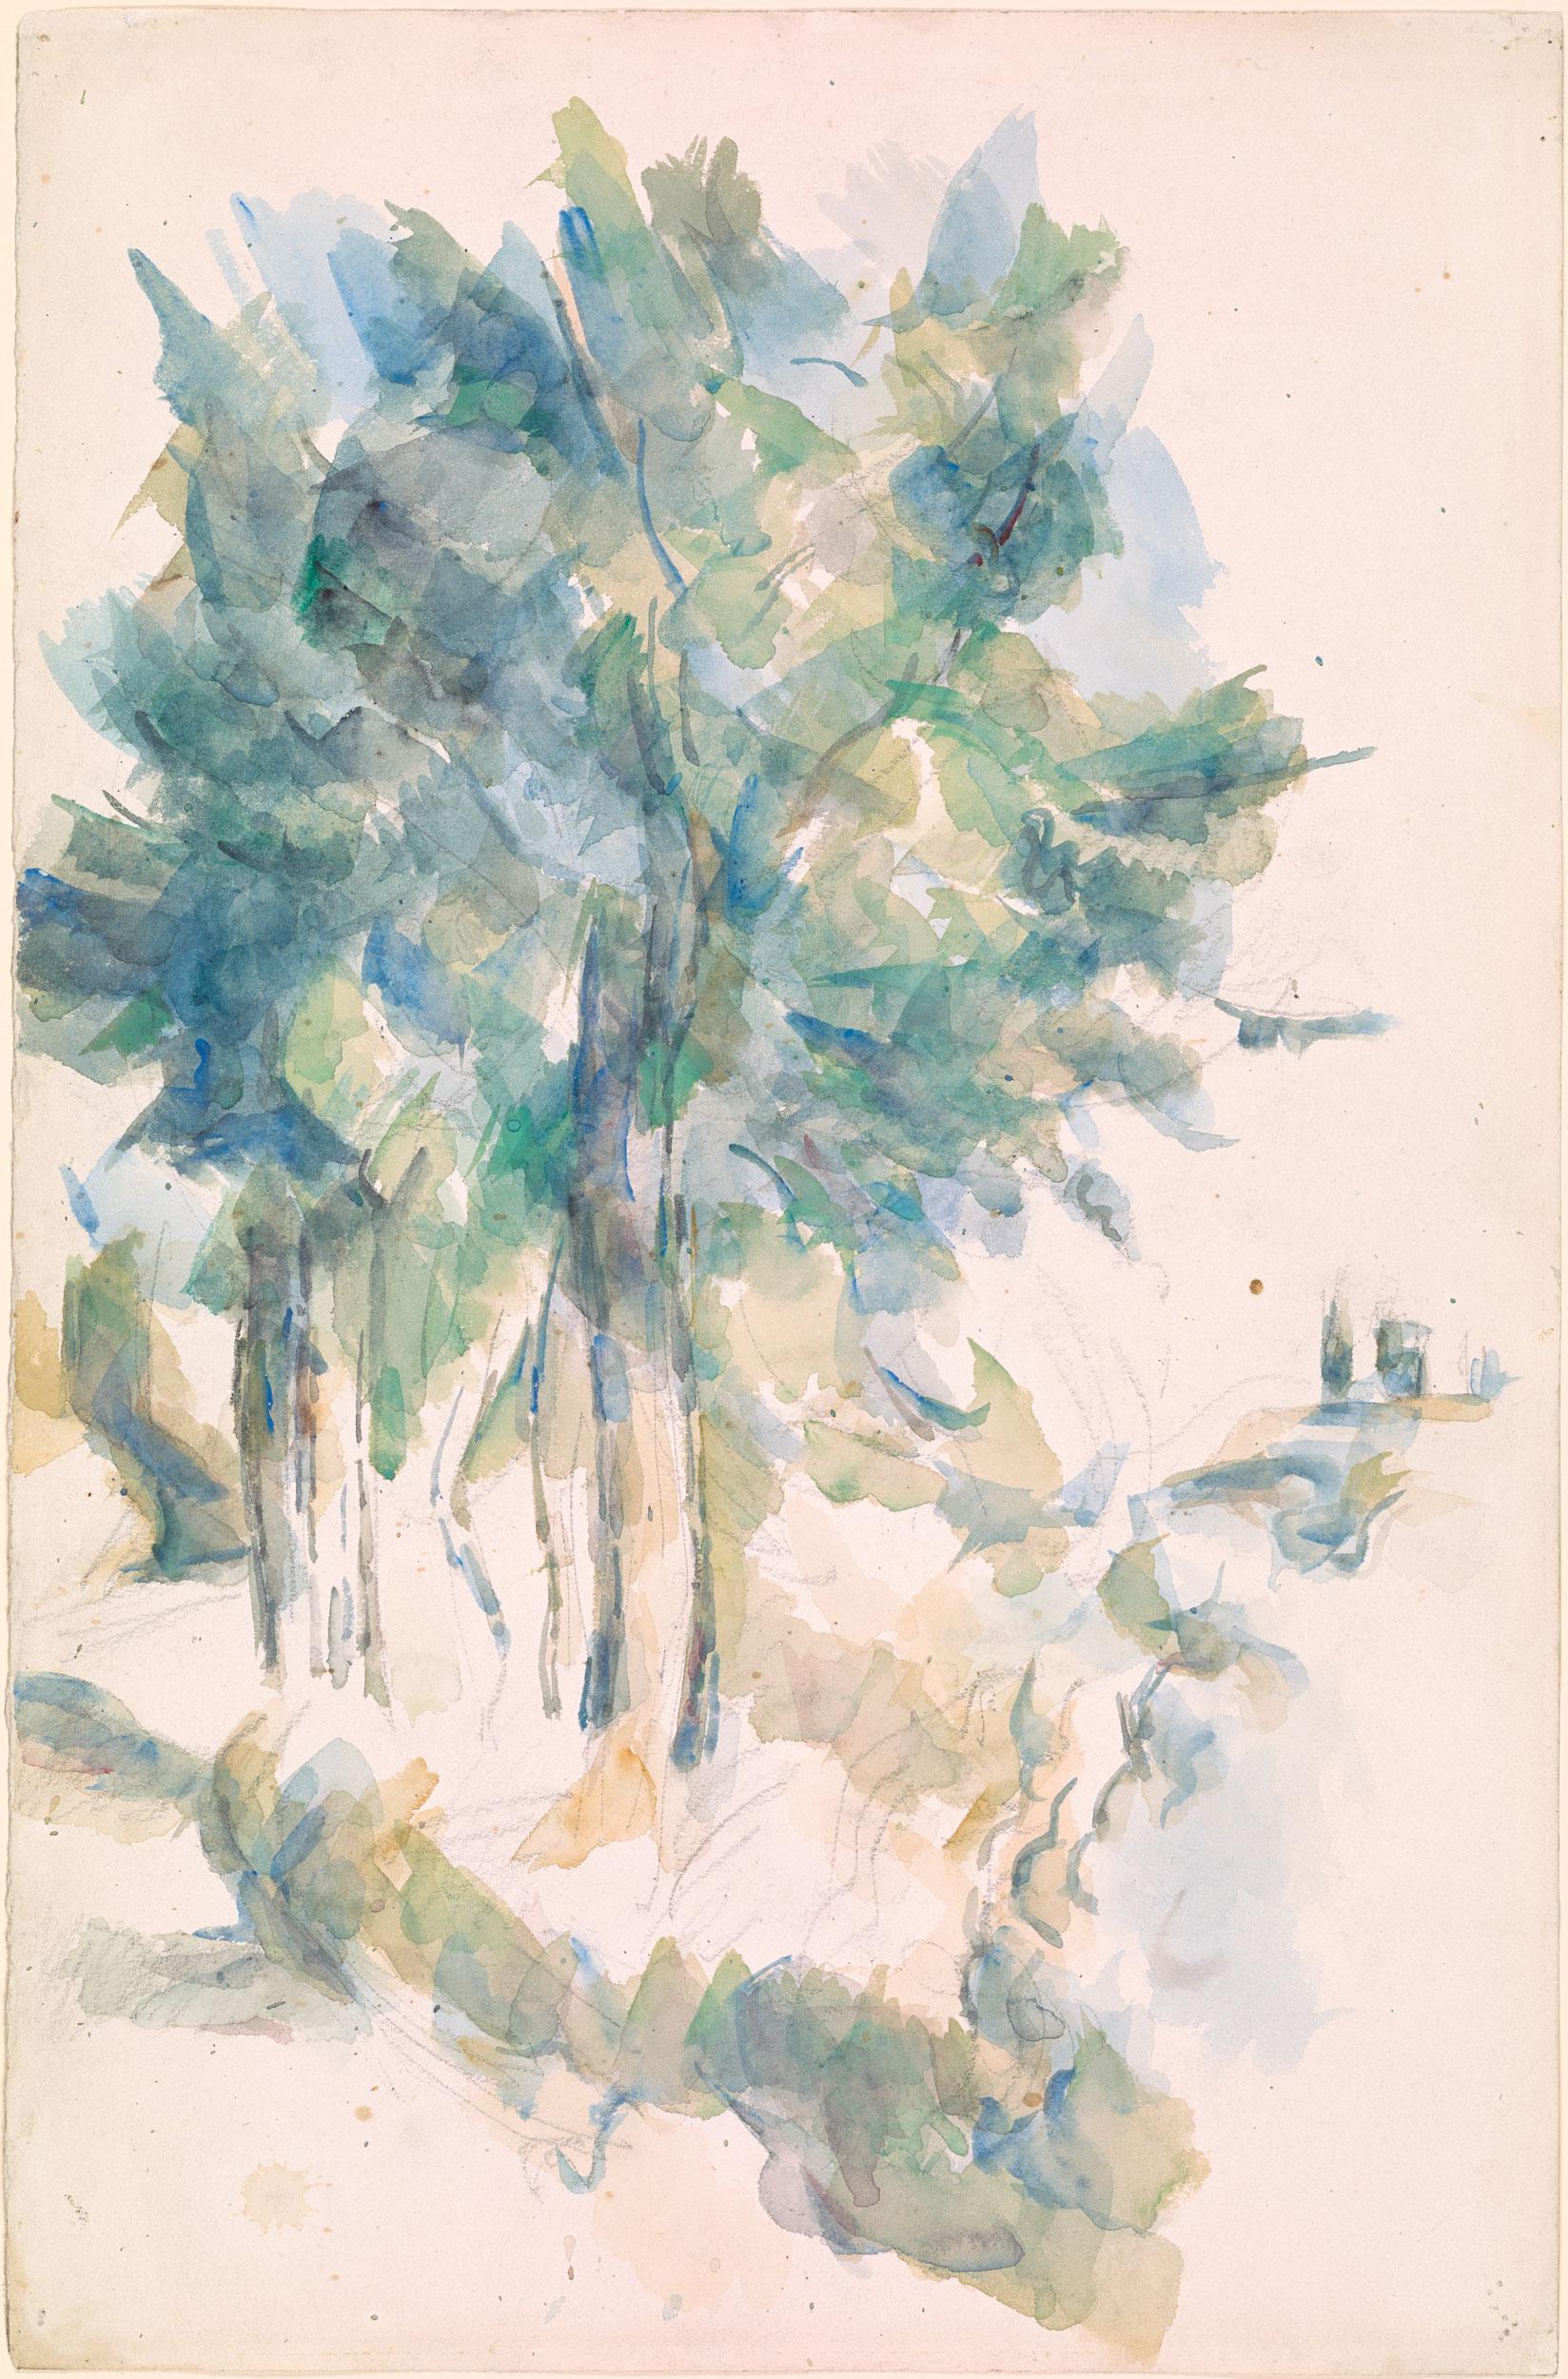 Paul Czanne  Trees  Drawings Online  The Morgan